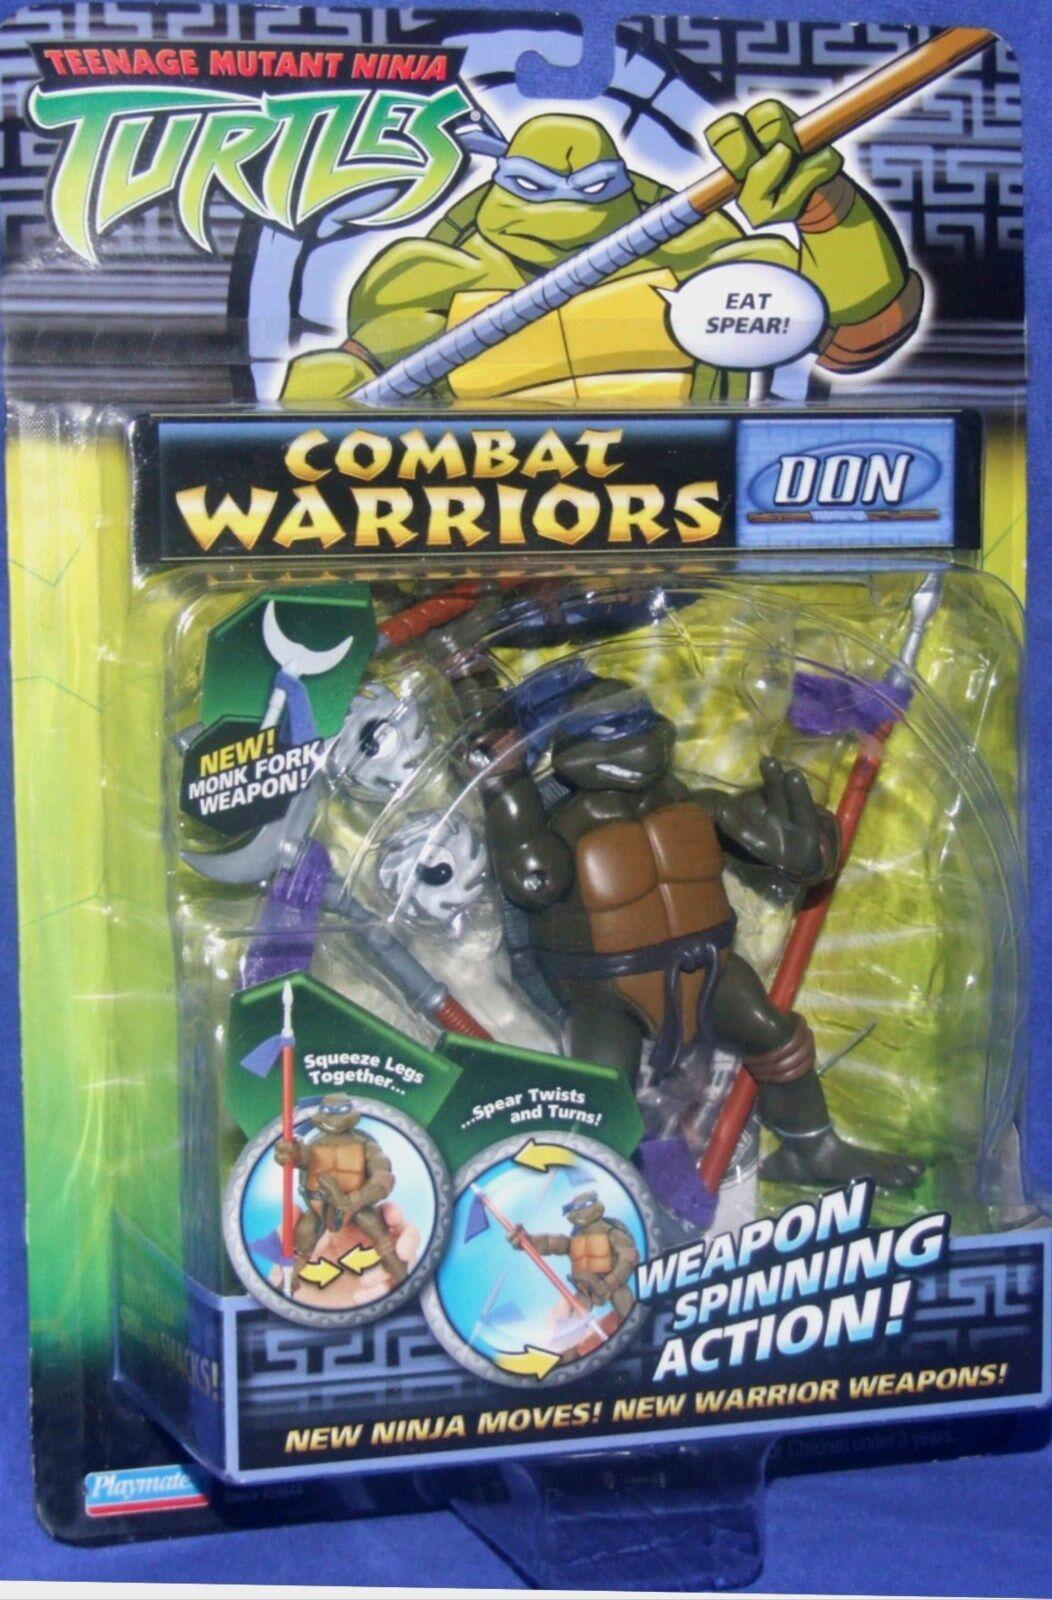 Teenage mutant ninja turtles  gegen krieger oder donatello 5 neue 2005 playmate